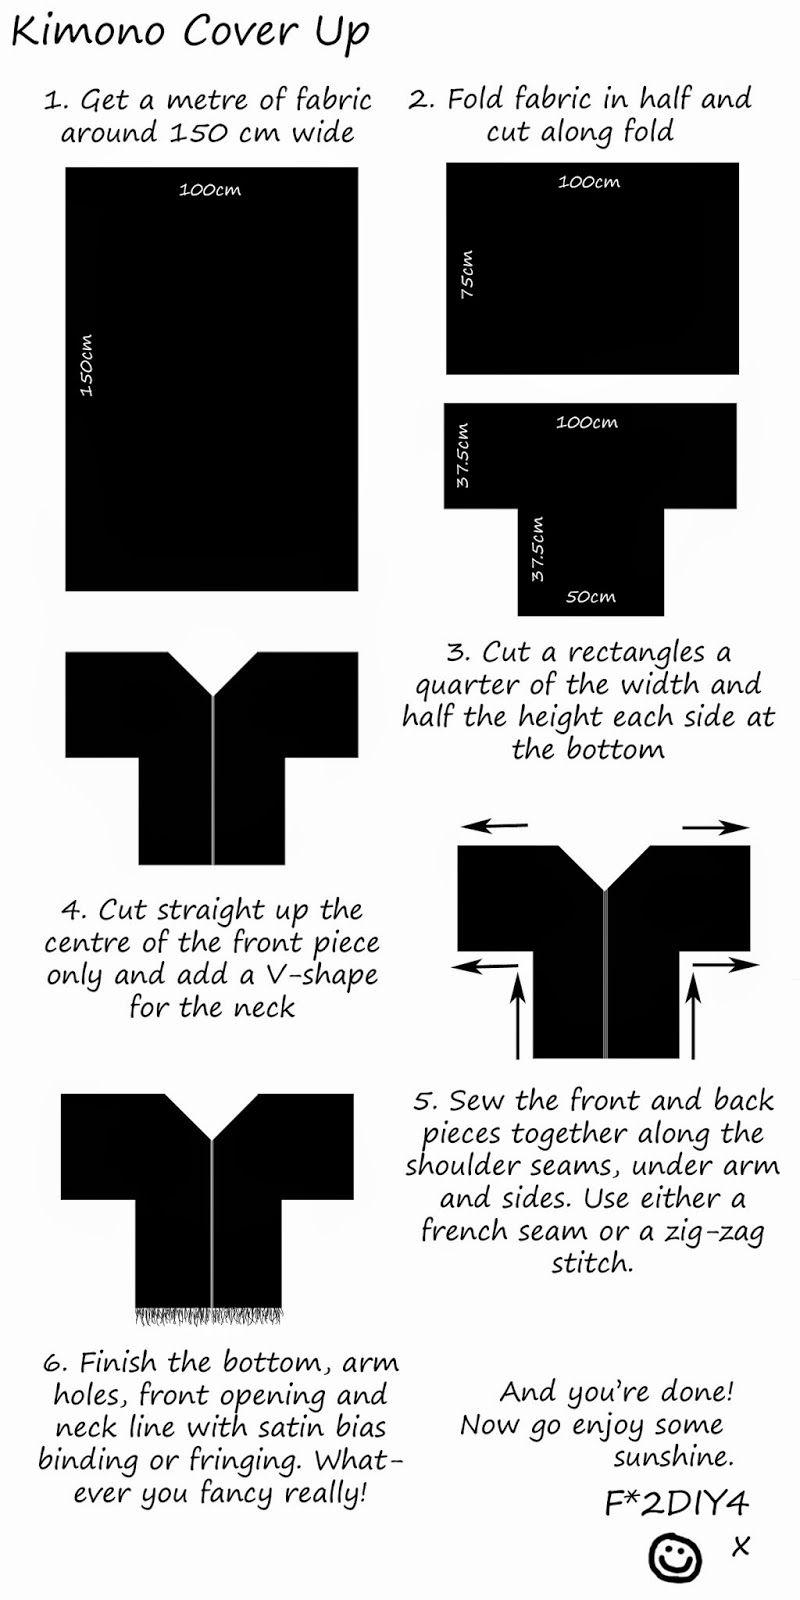 kimono+cover+up+copy.jpg 800×1,600 pixeles | Disfrases | Pinterest ...